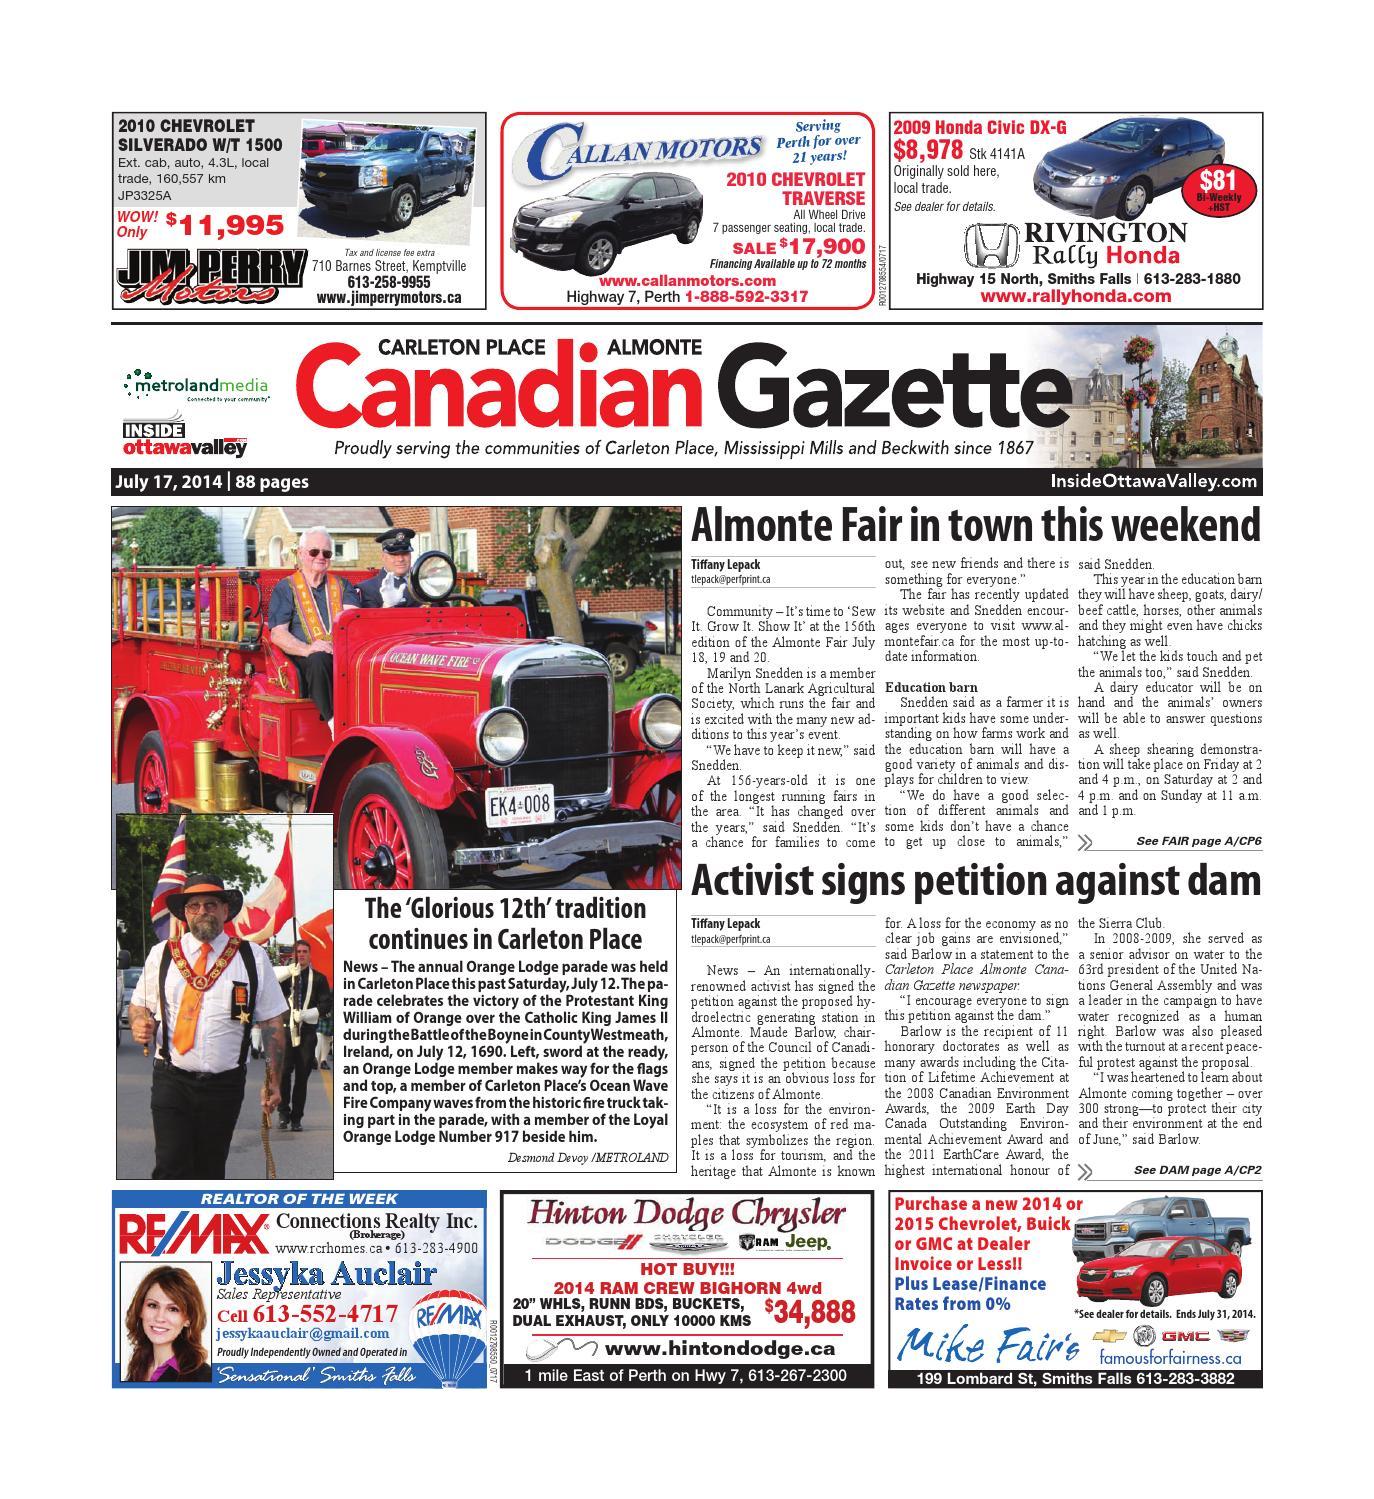 Heartland Toronto Call Car Area Mississauga Candy Incall Escort Divorce